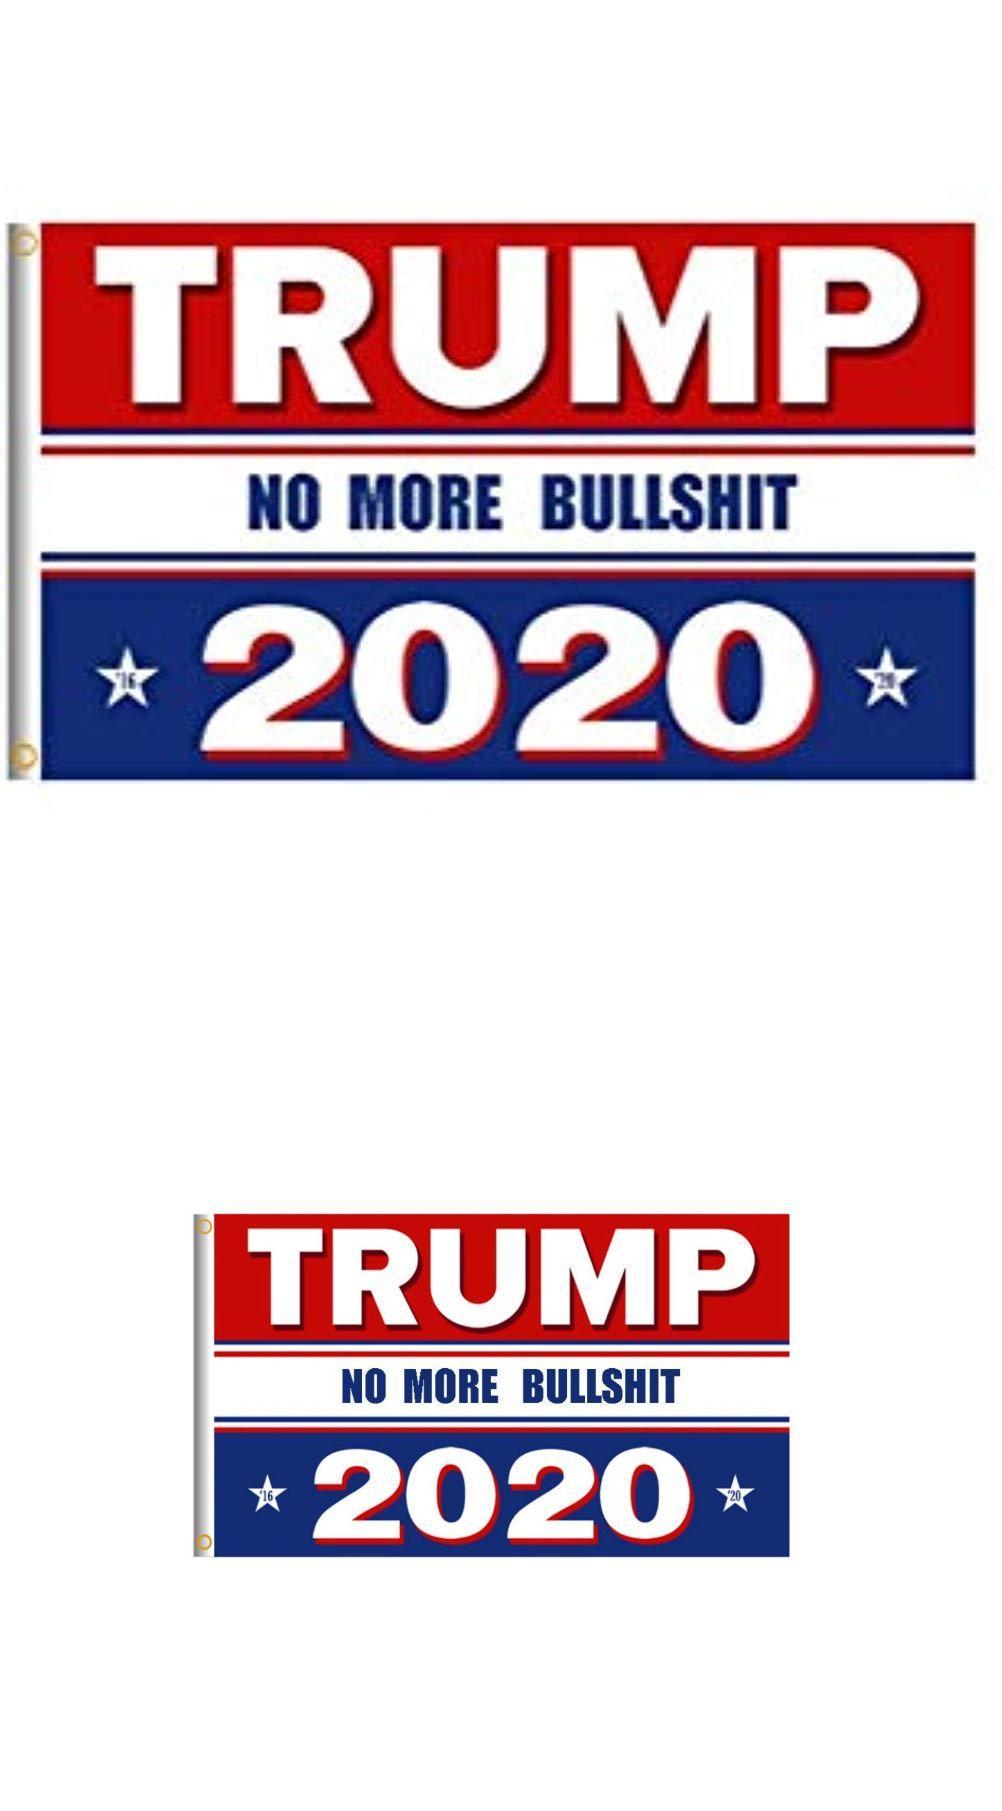 Trump 2020 Wallpapers 1002x1811